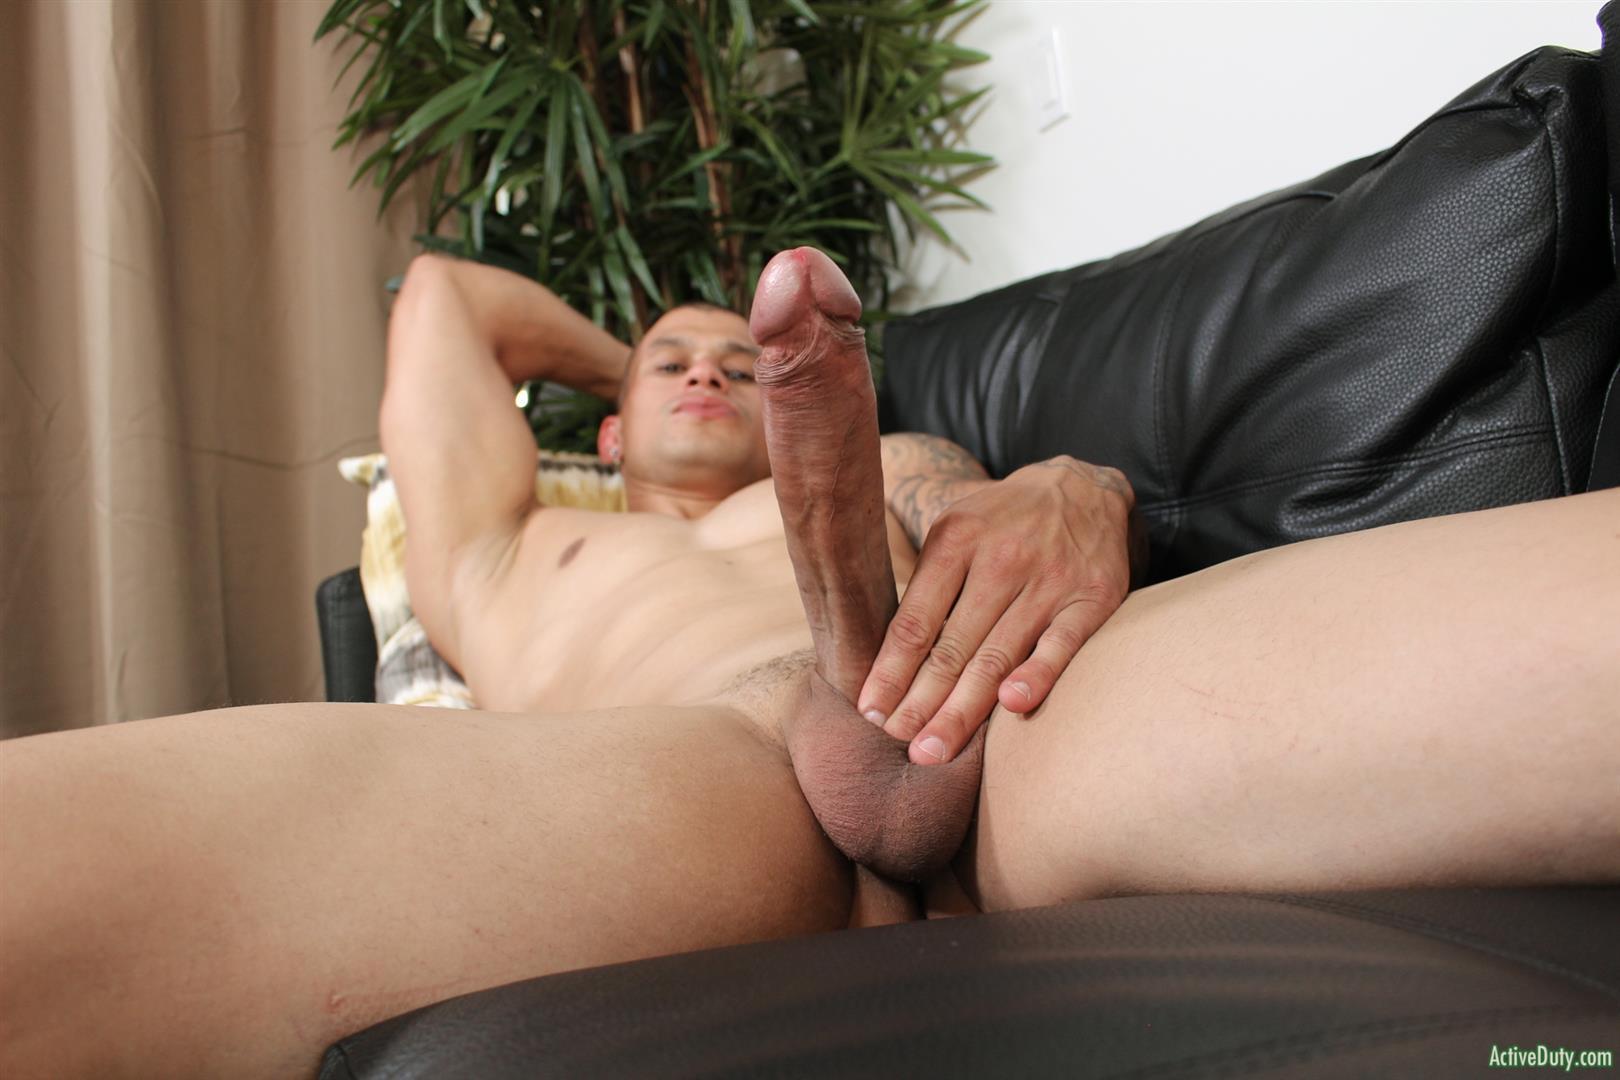 Active-Duty-Rico-Military-With-A-Big-Uncut-Cock-Masturbation-Pics-11 Muscular Military Hunk Shows Off A Massive Uncut Cock